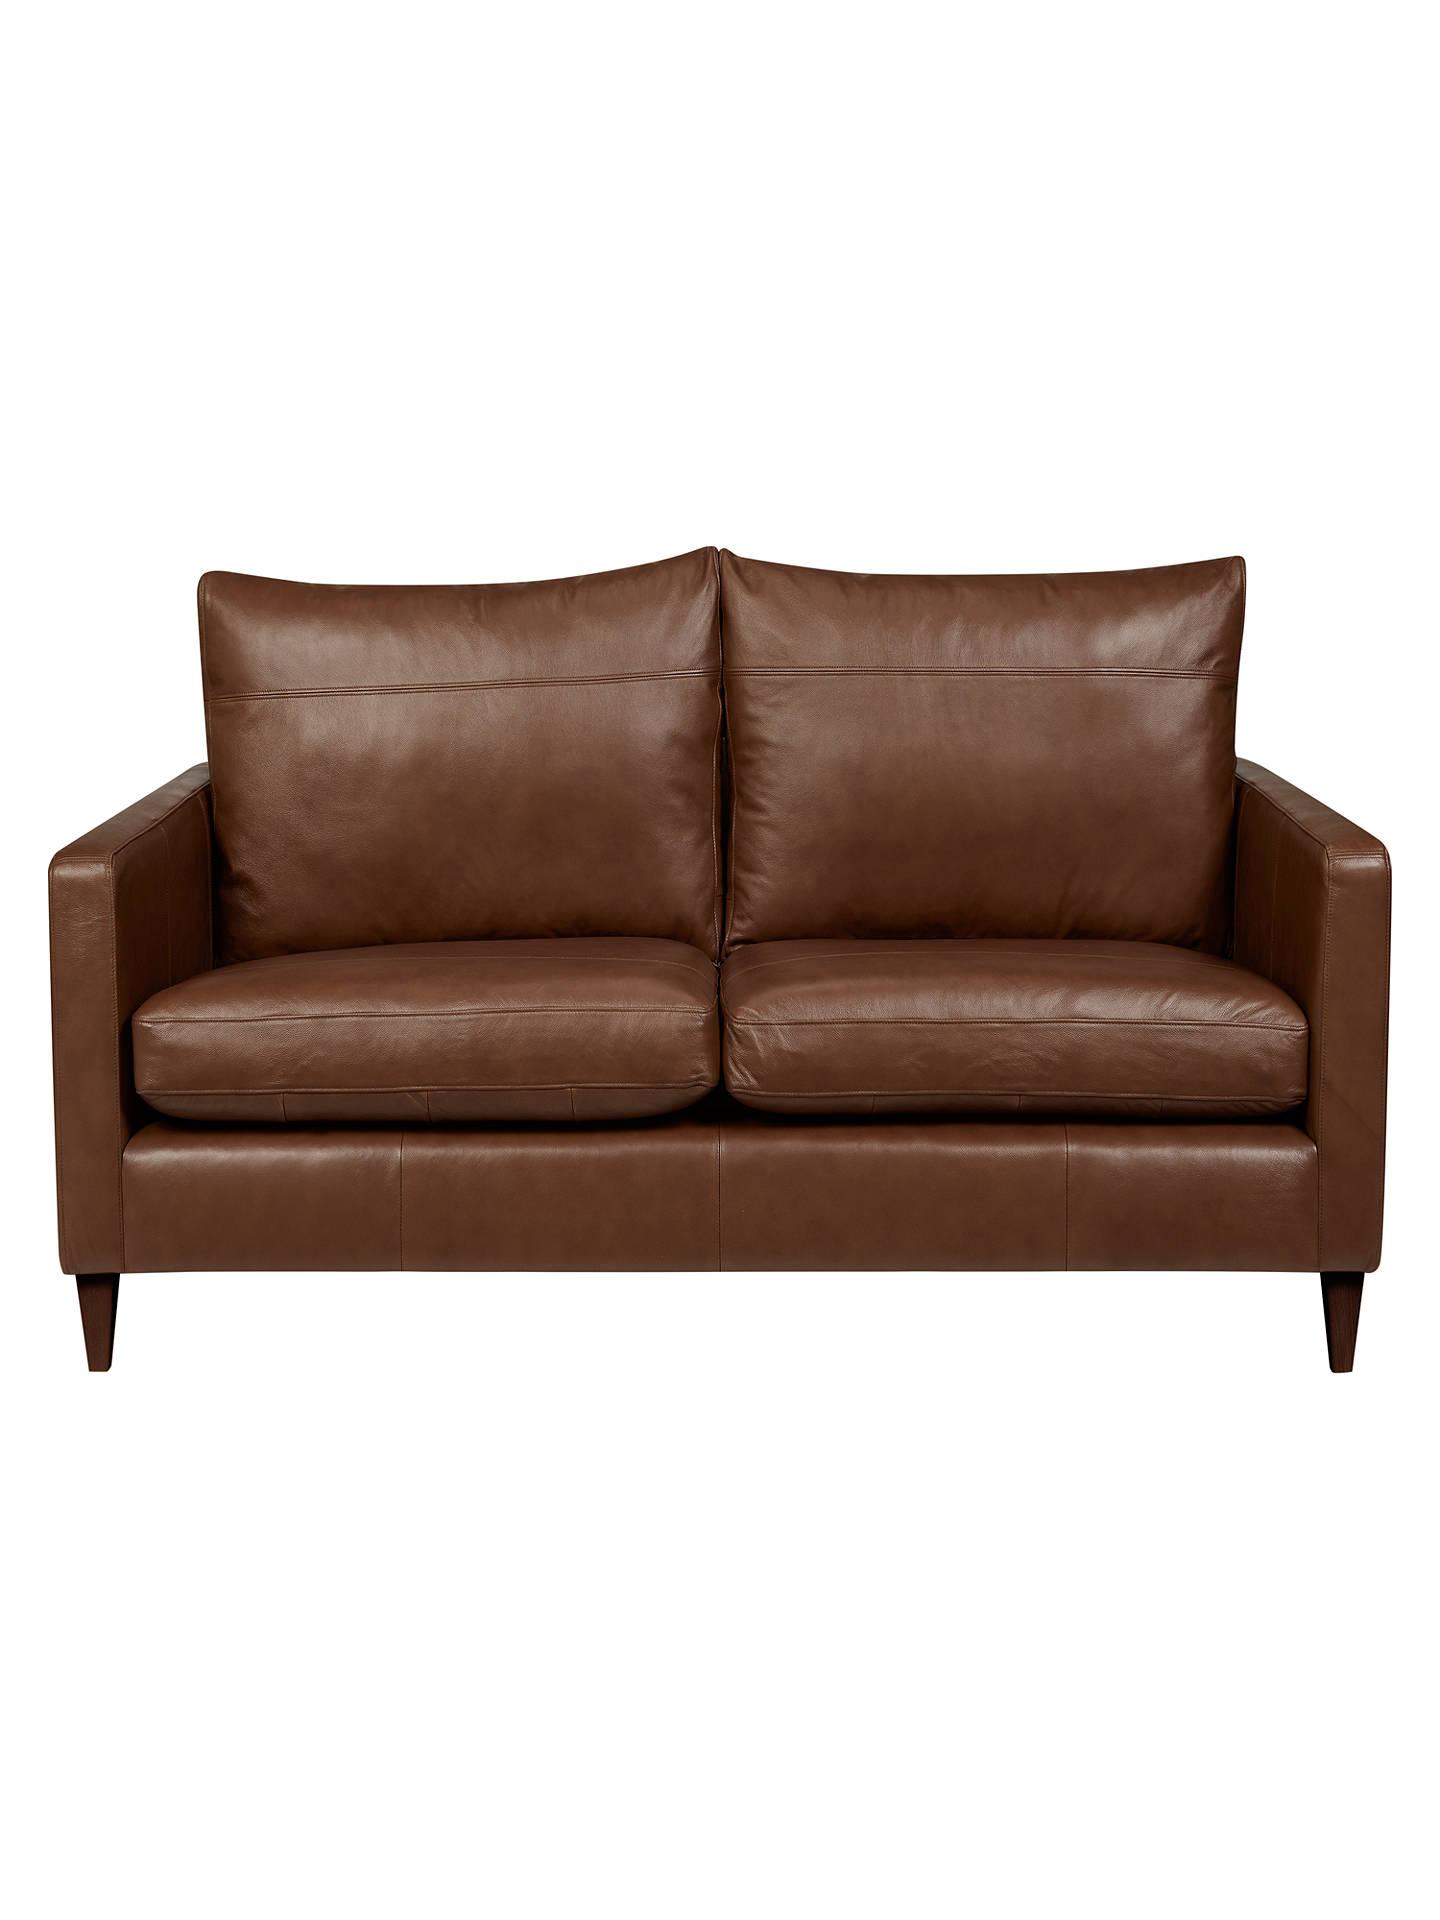 Awesome John Lewis Partners Bailey Leather Small 2 Seater Sofa Dark Leg Milan Chestnut Lamtechconsult Wood Chair Design Ideas Lamtechconsultcom